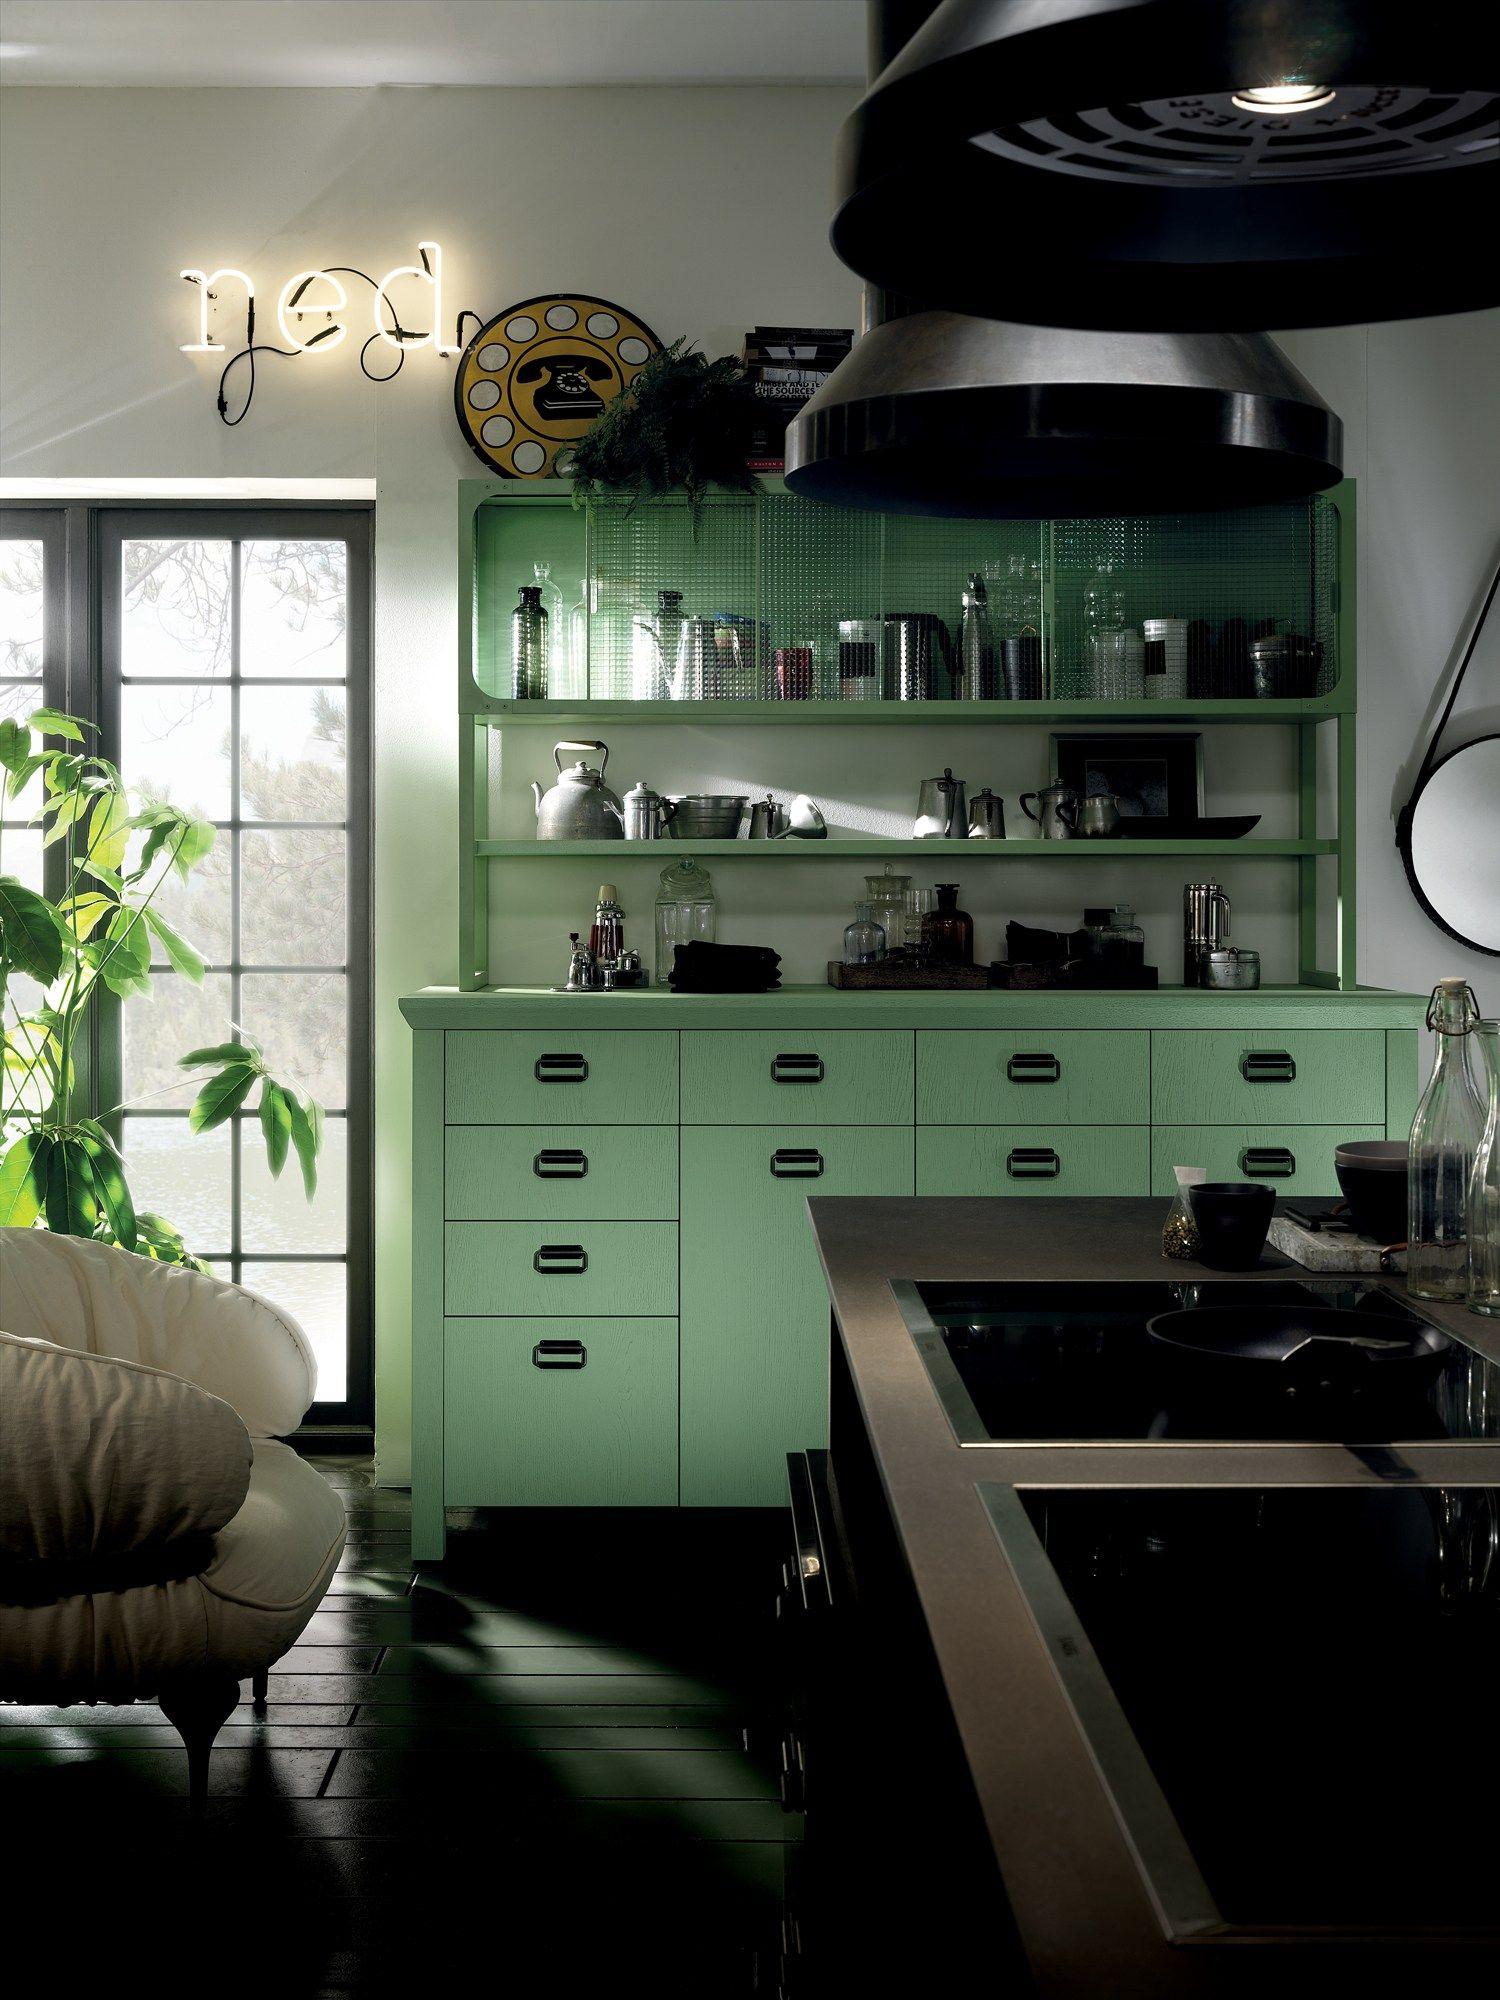 Cucina componibile diesel social kitchen linea scavolini by scavolini design diesel living with - Cucina diesel scavolini ...